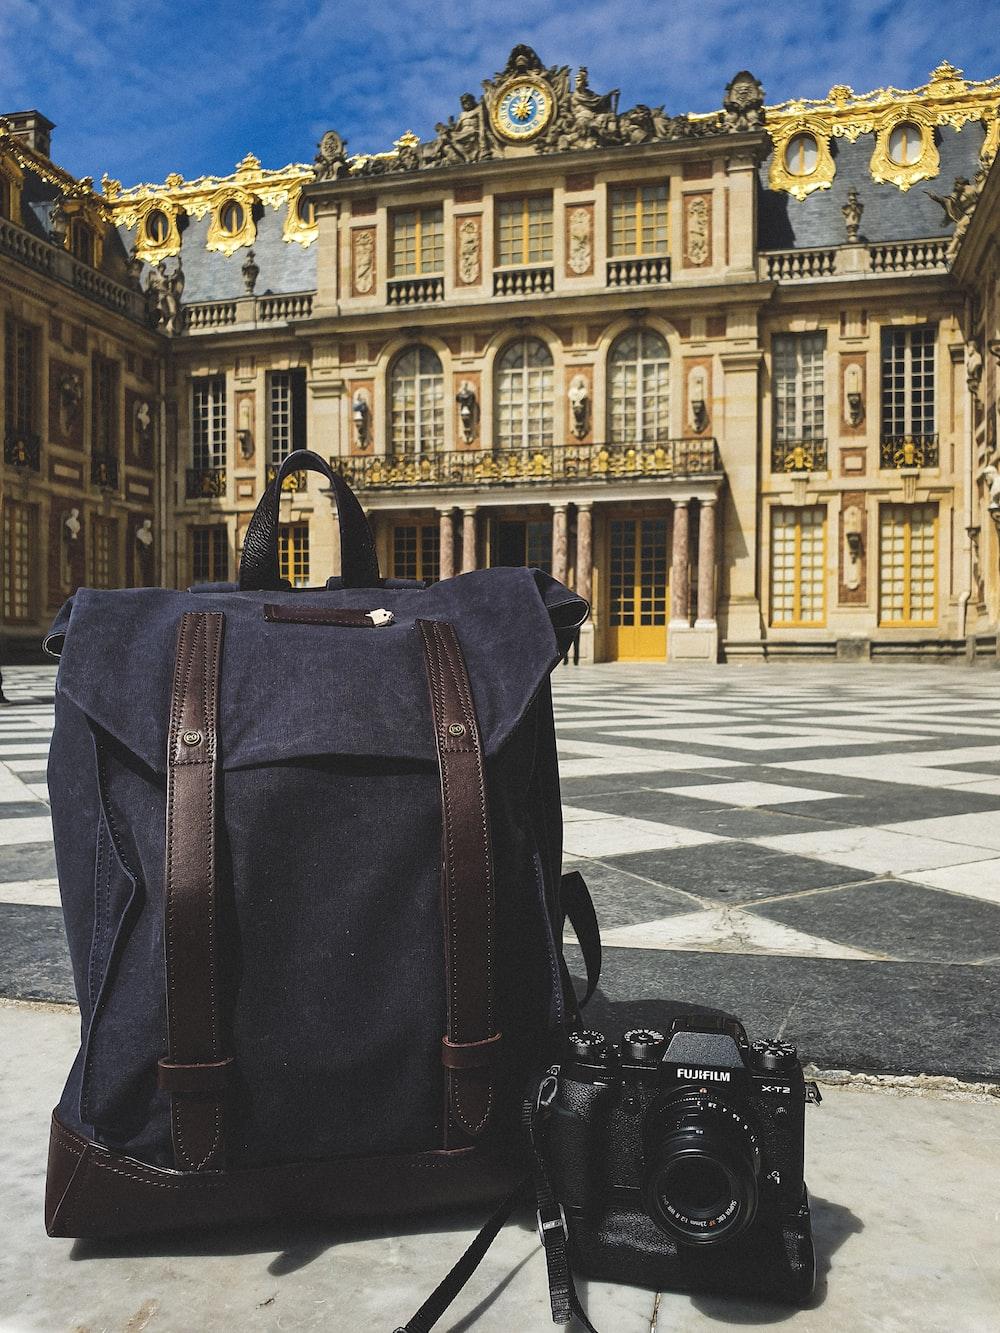 black DLSR camera and bag at Versailles